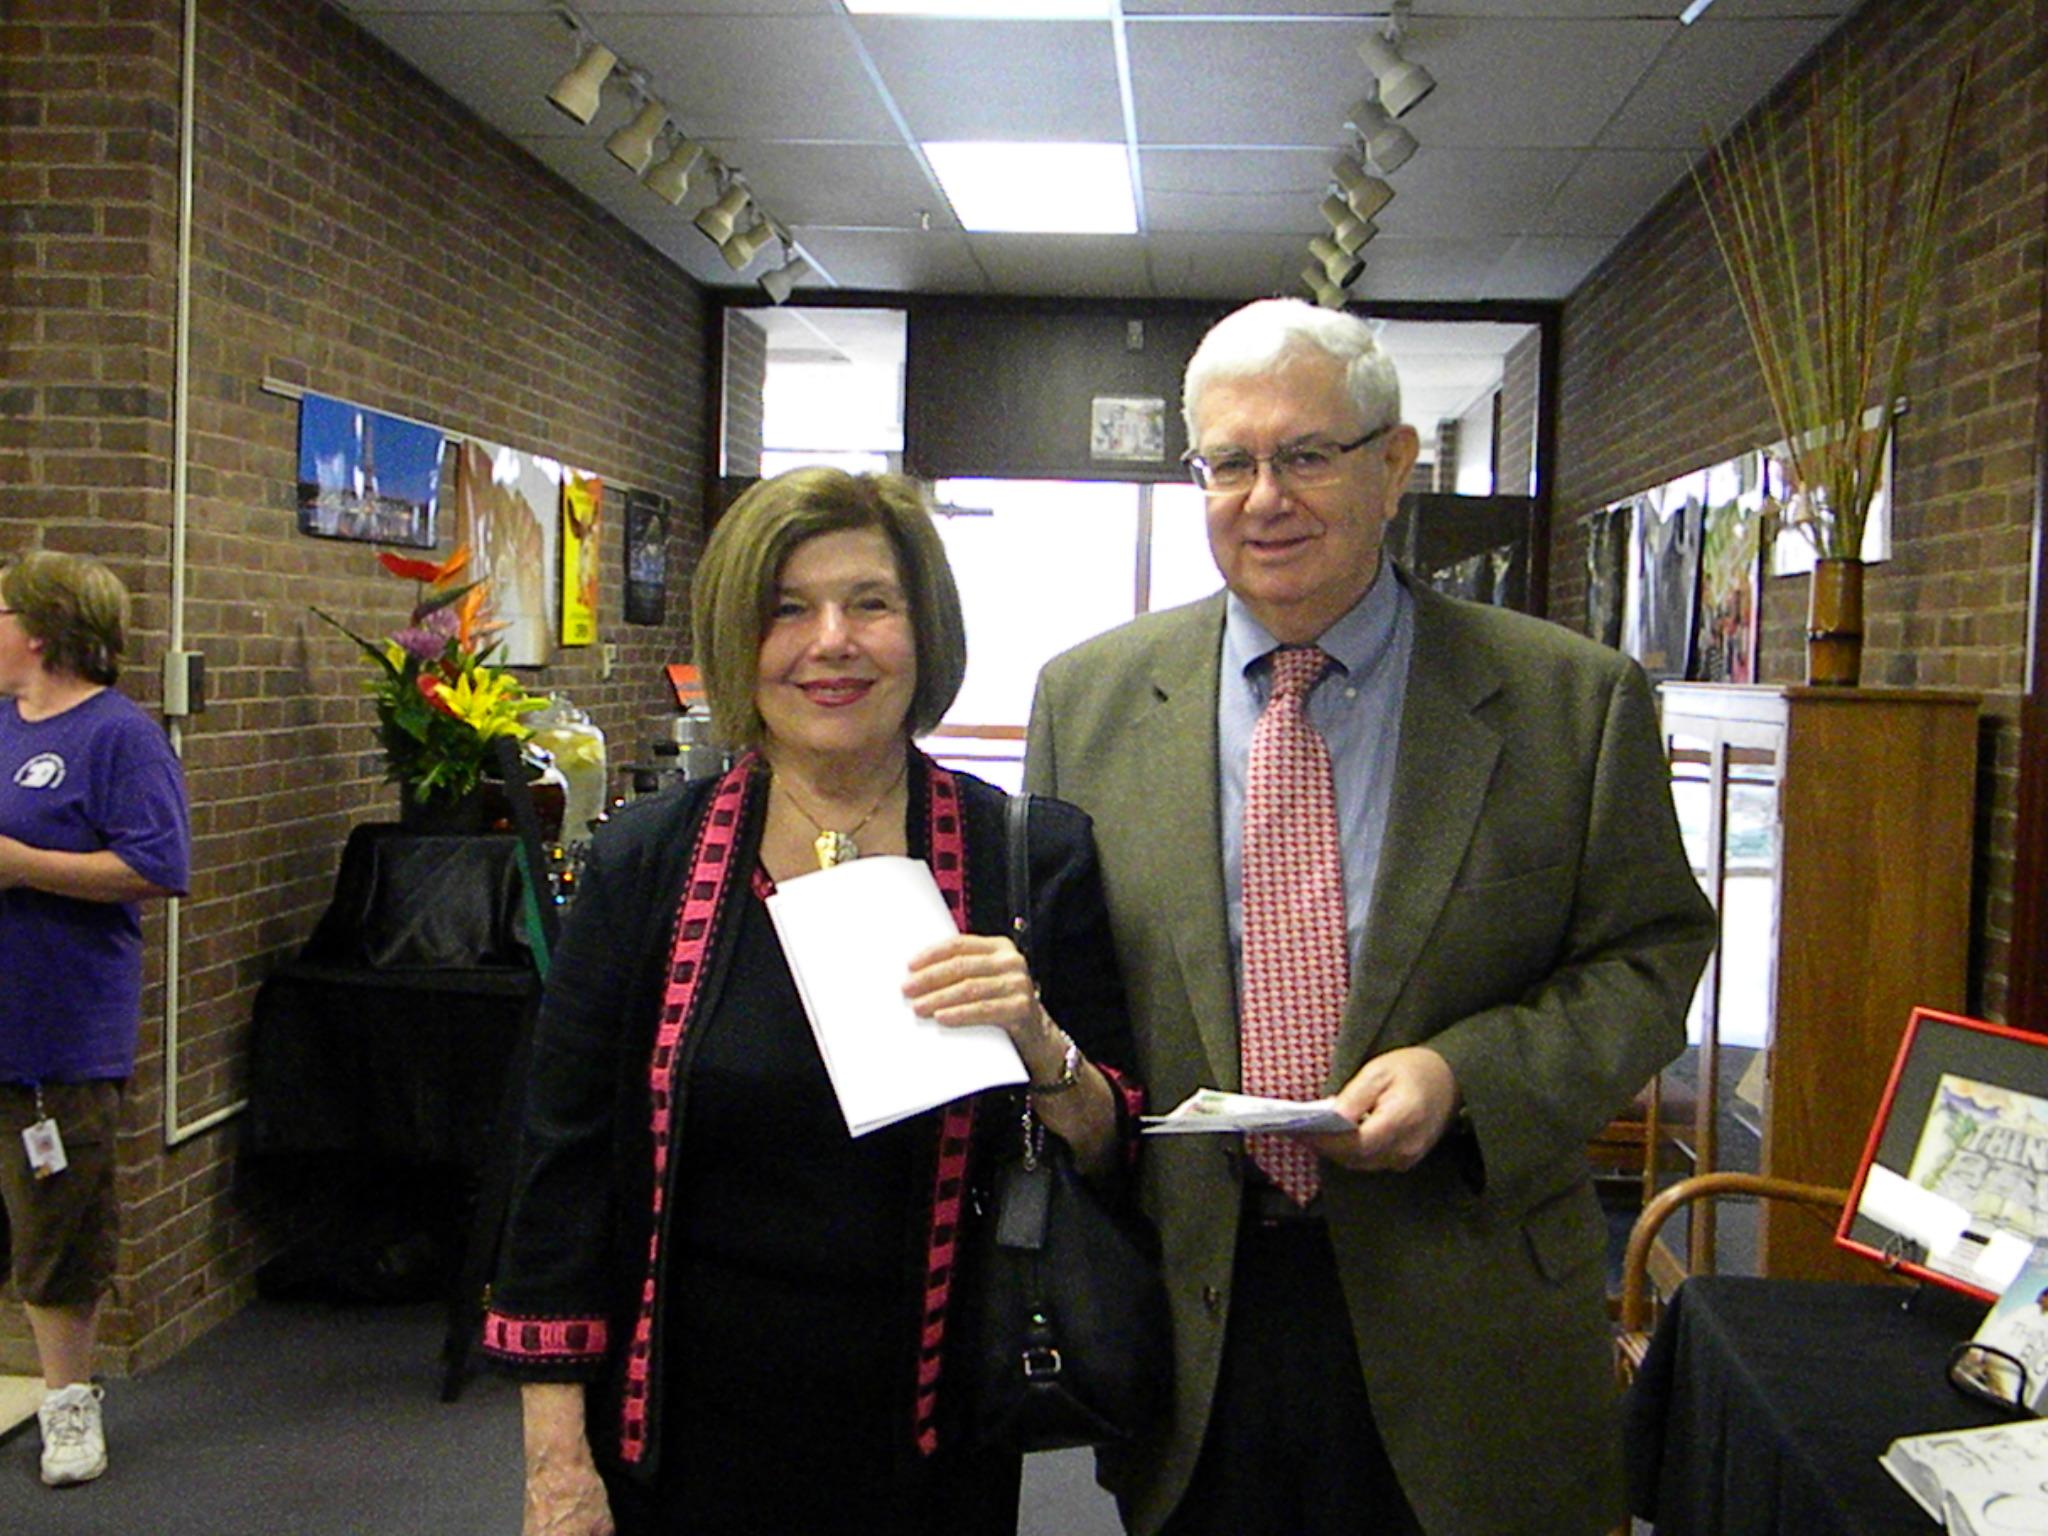 Louis and Phyllis Friedman